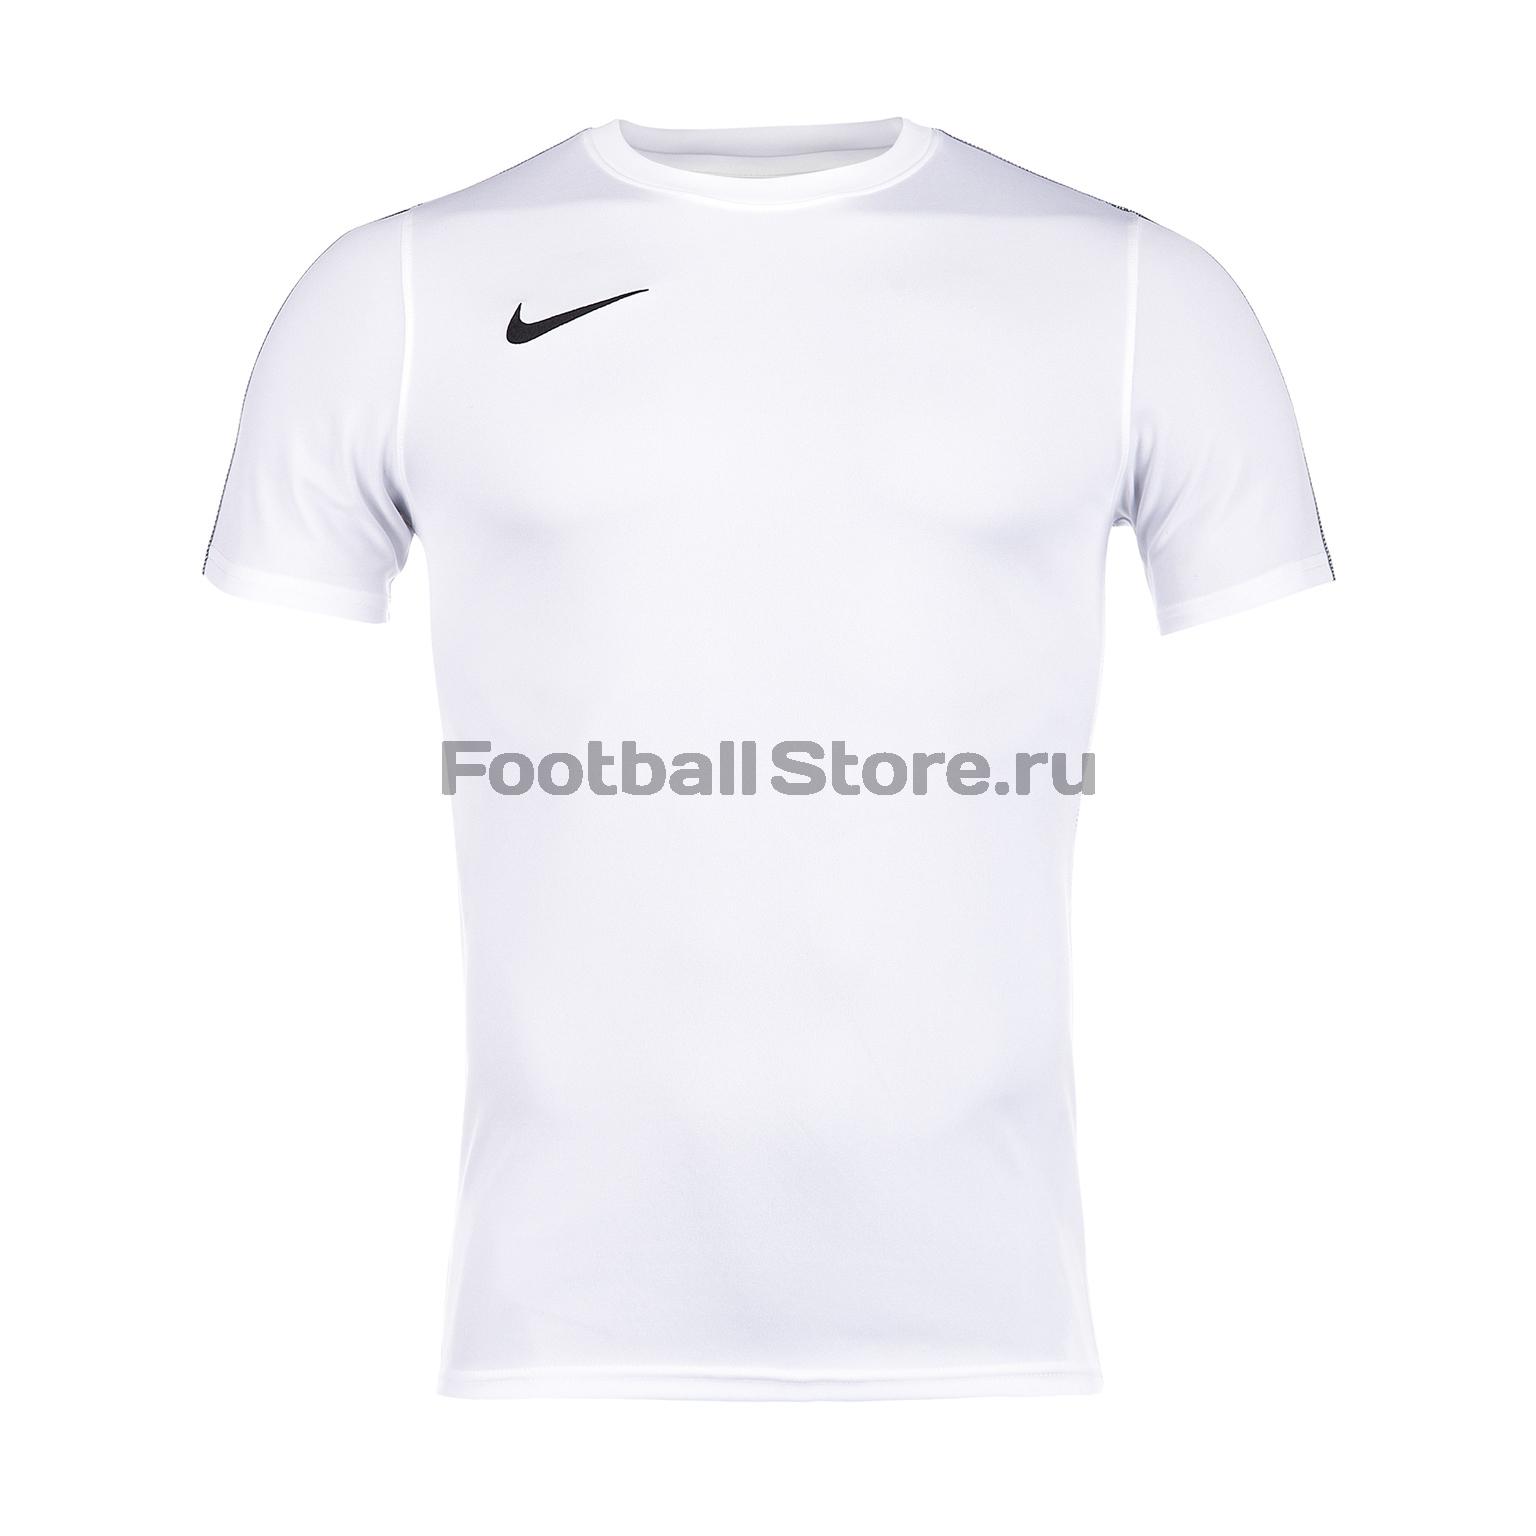 Футболка тренировочная Nike Park18 SS AA2046-100 футболка игровая nike dry tiempo prem jsy ss 894230 411